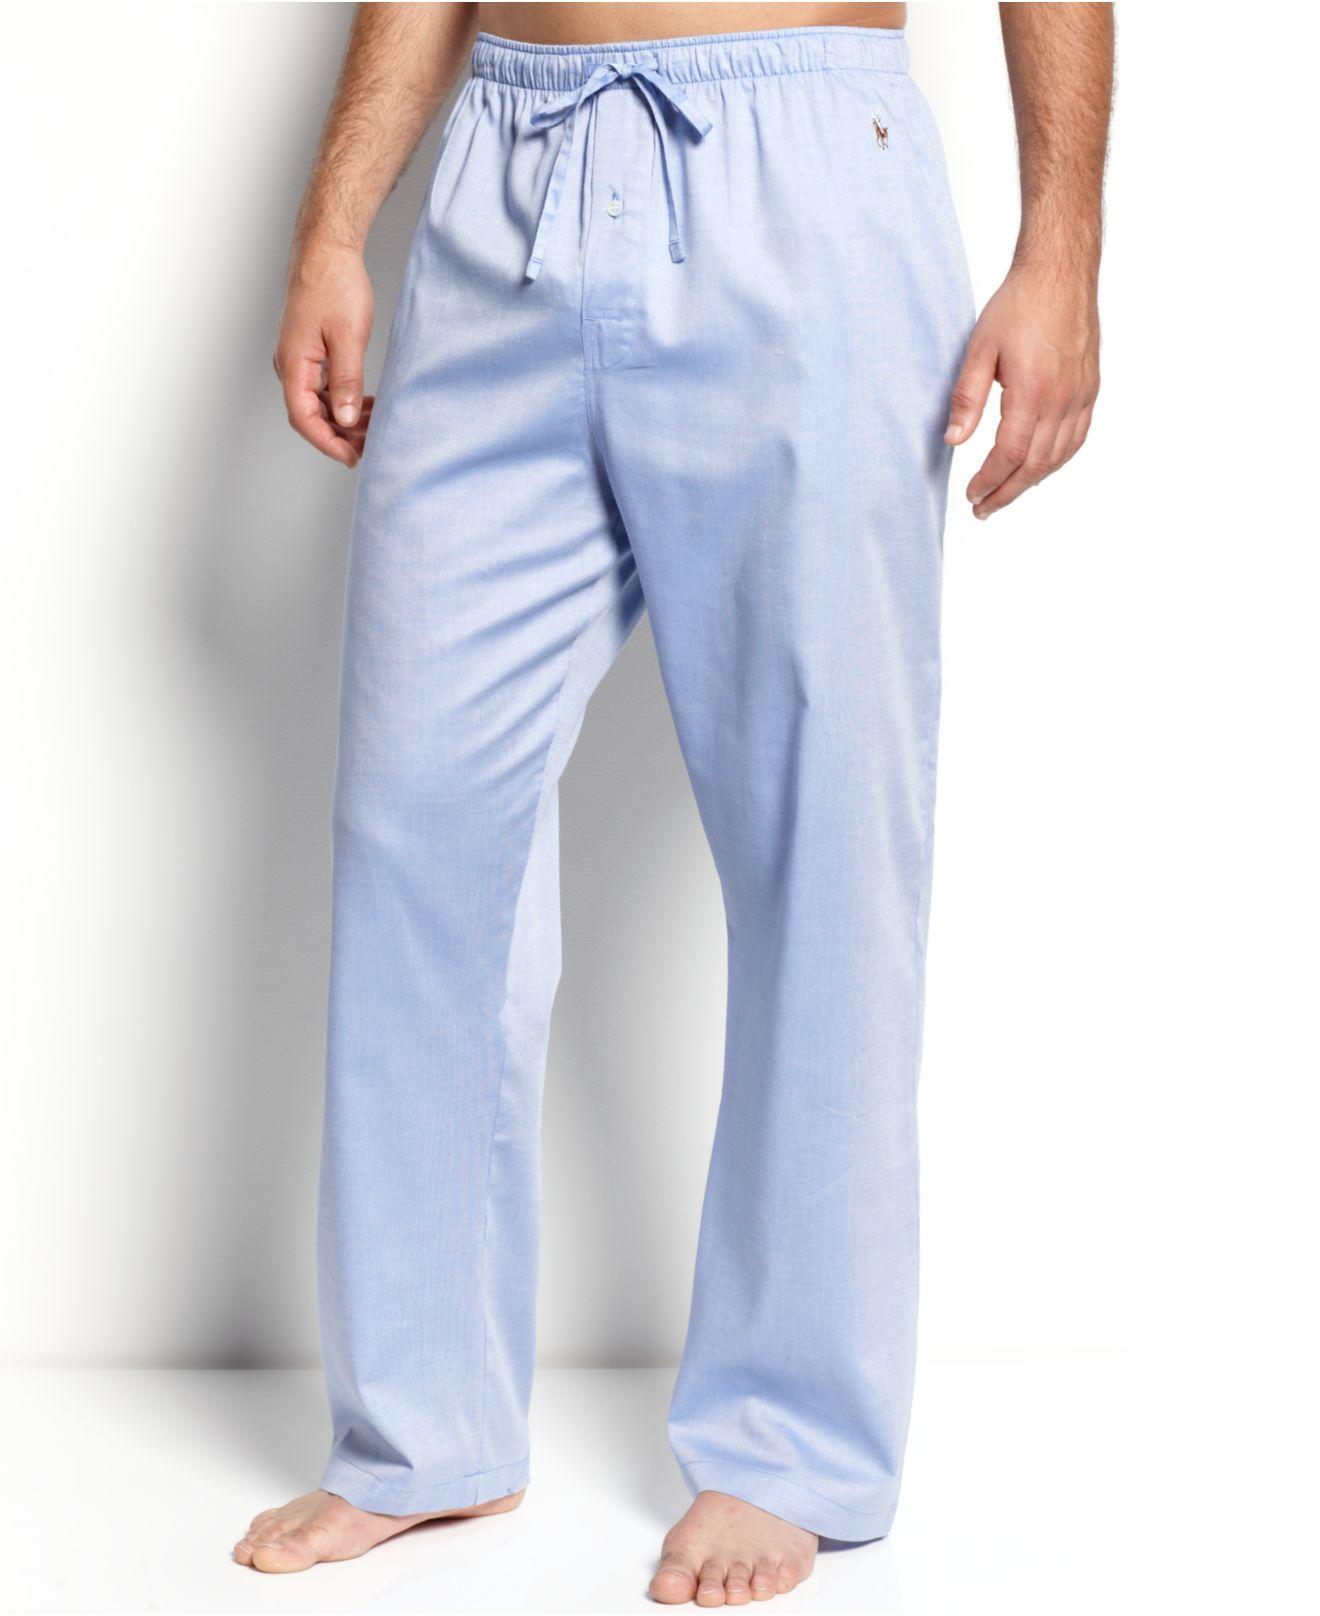 Lyst - Polo Ralph Lauren Men s Woven Oxford Pajama Pants in Gray for Men 31b4813ae